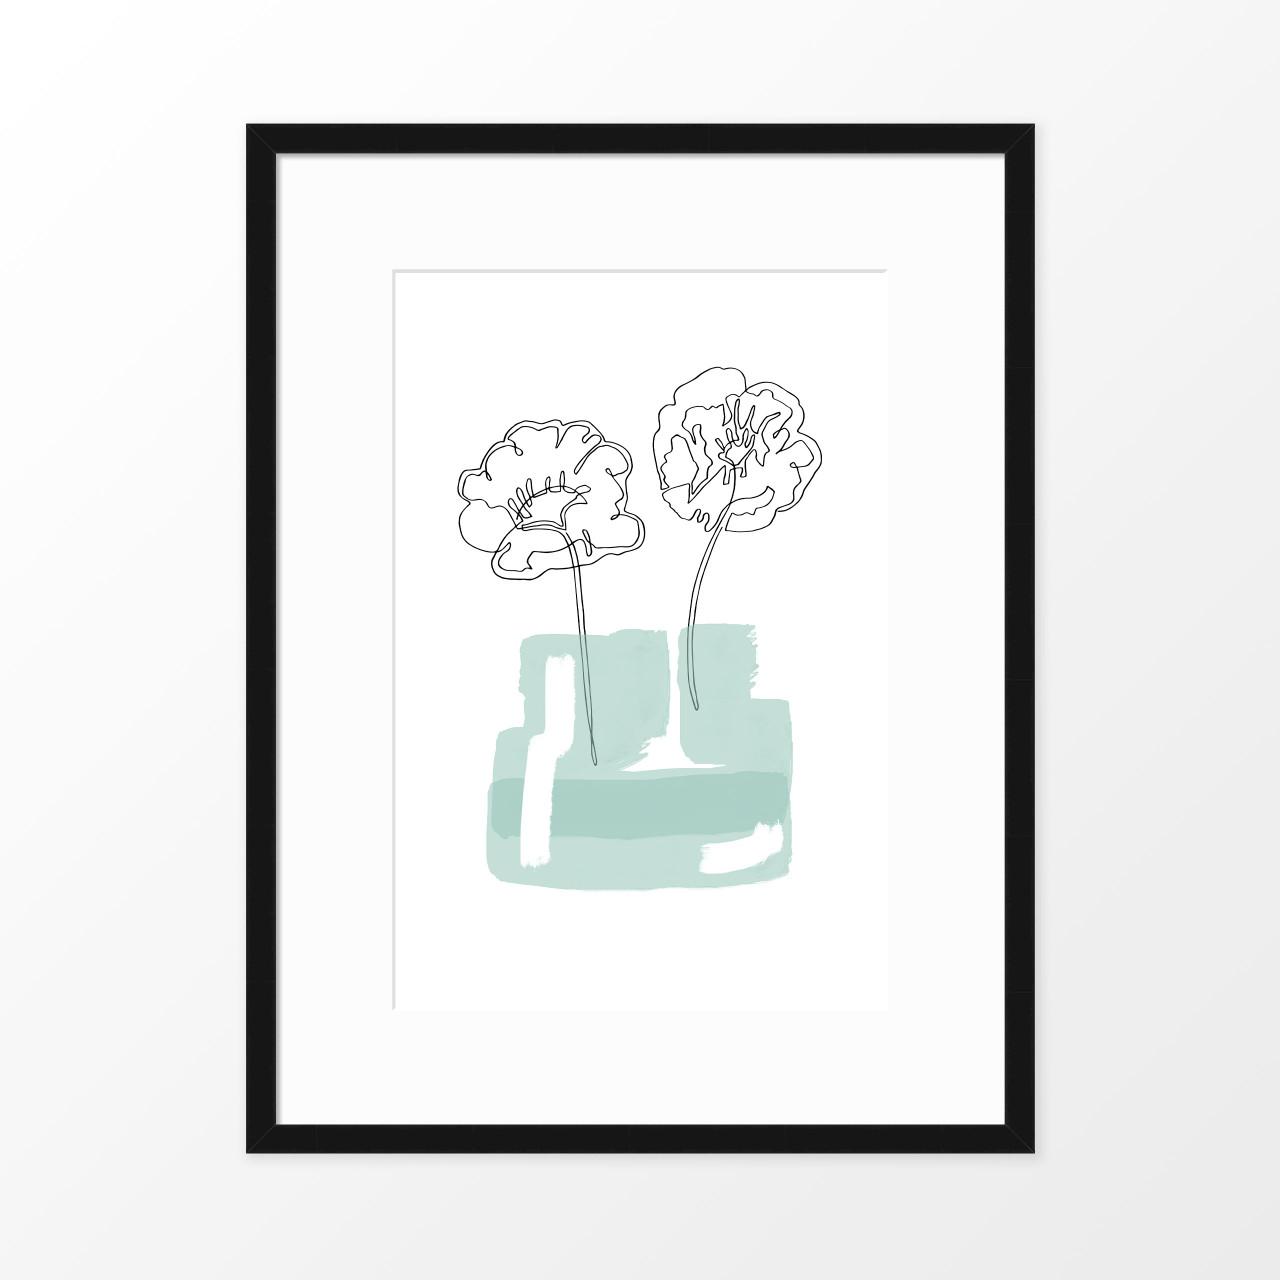 'Poppy Jar' Original Art Print from The Printed Home